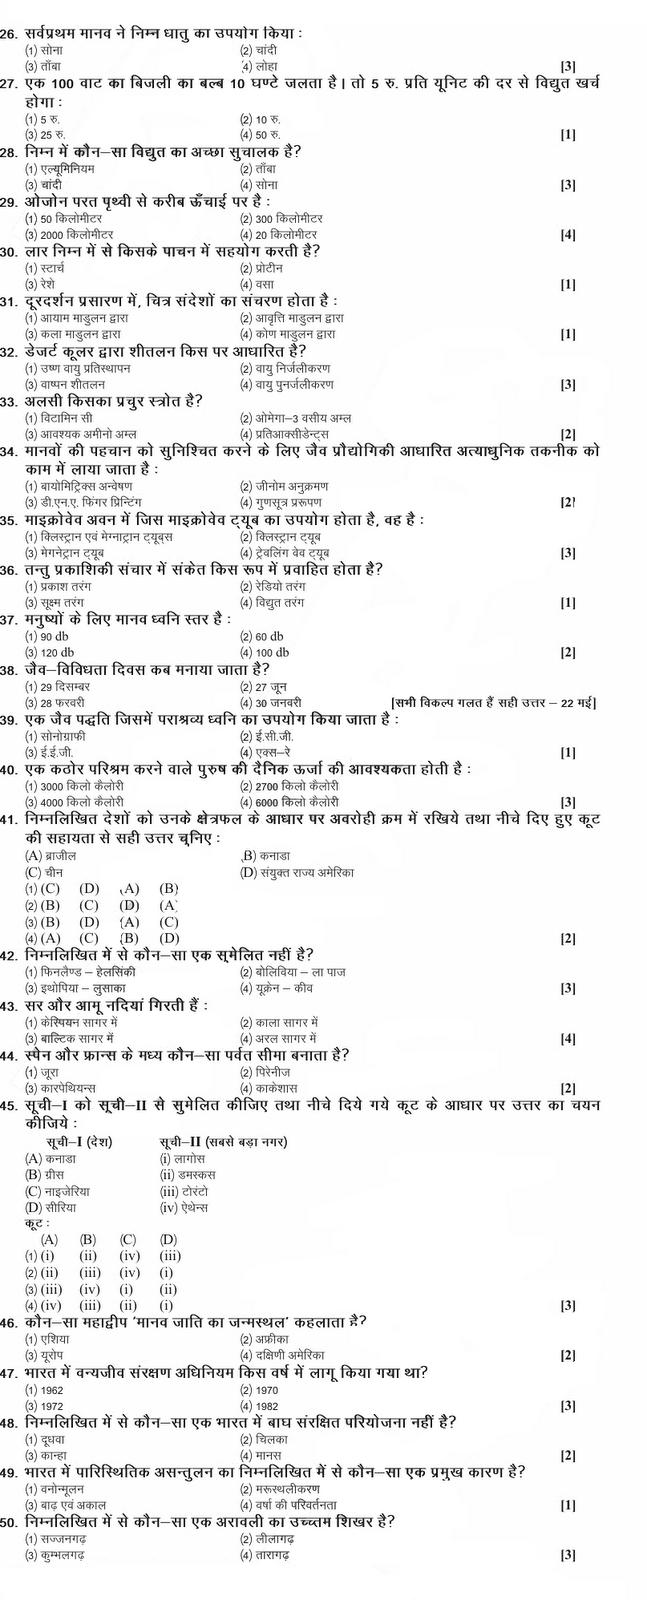 Rajasthan Teacher Eligibility Test Rtet 2013 Online .html